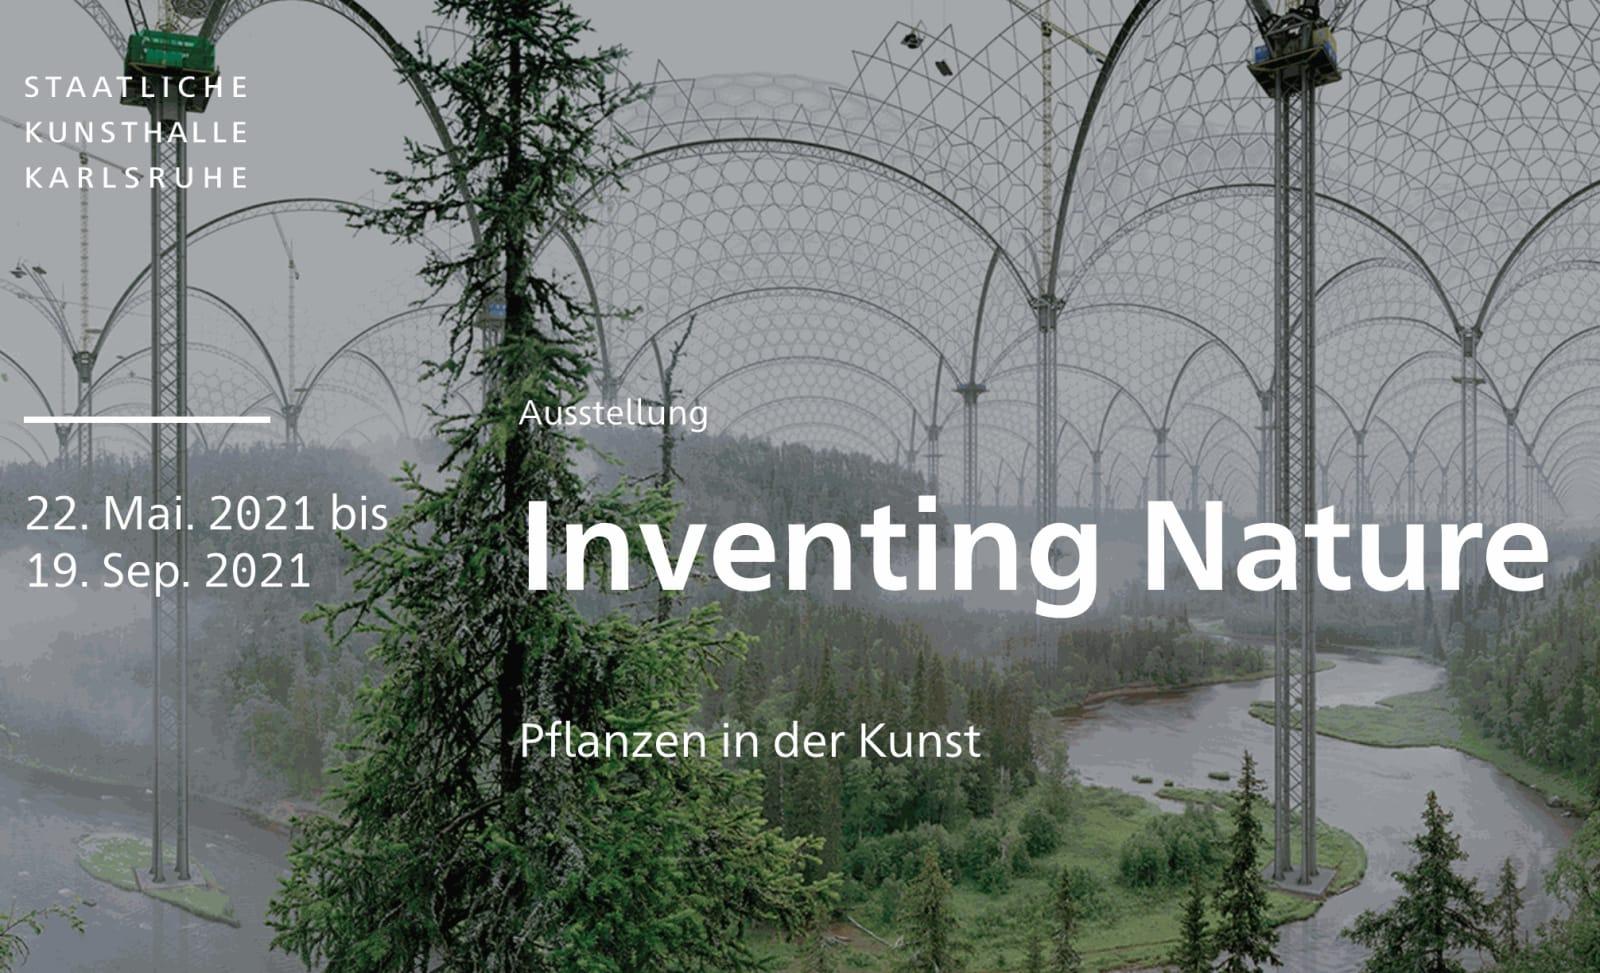 Joan Jonas Inventing Nature – Pflanzen in der Kunst (group exhibition) Staatliche Kunsthalle Karlsruhe, Karlsruhe, Germany Spring 2021